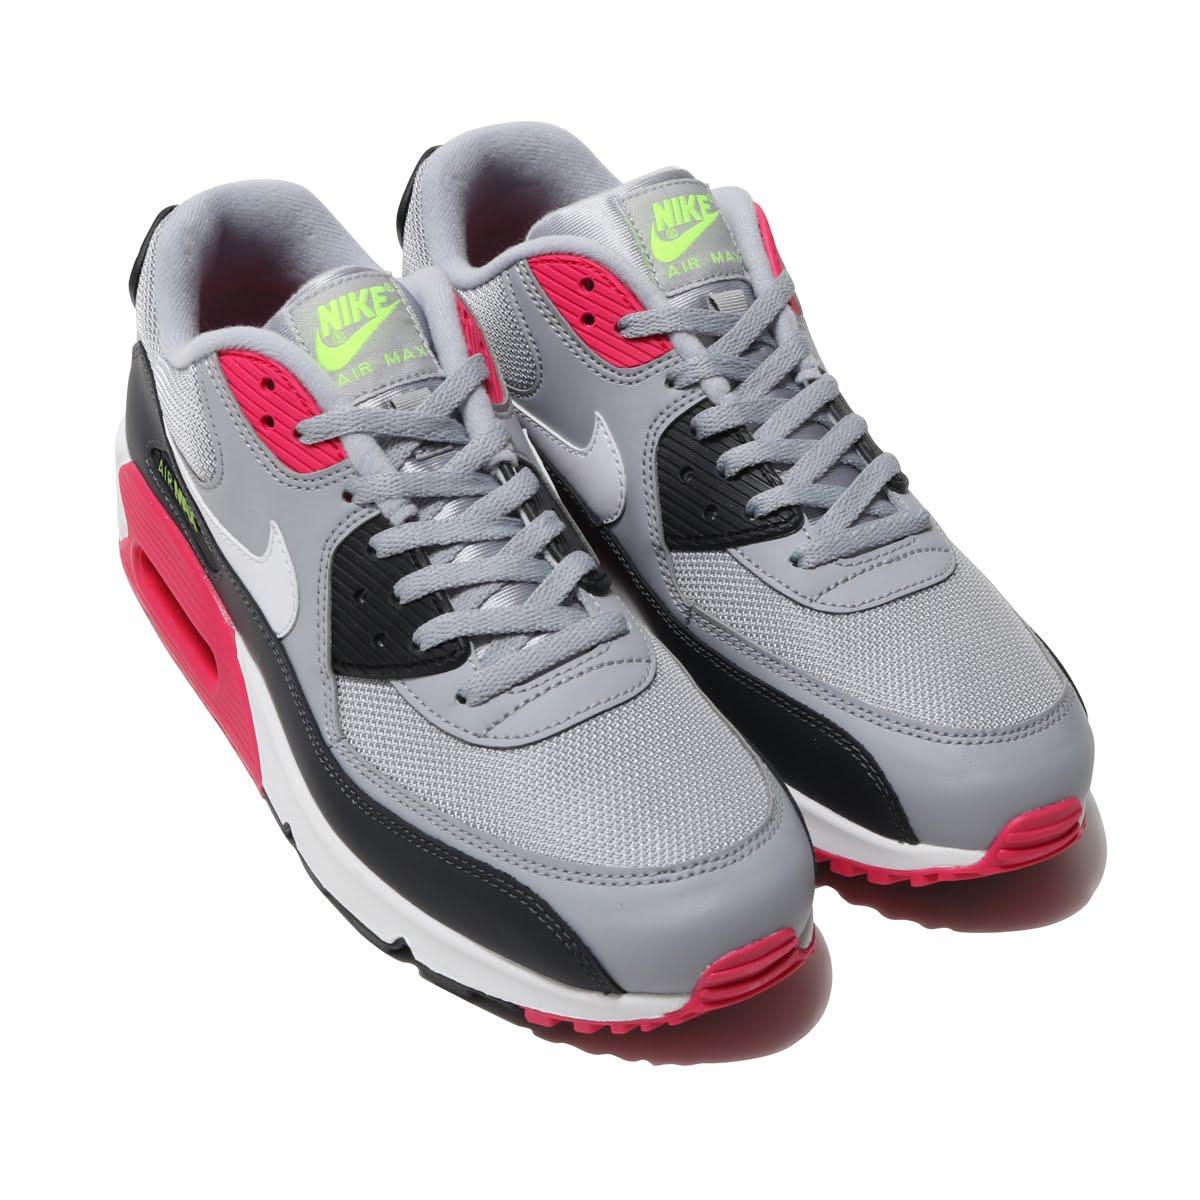 Nike EssentialWolf 90 Air Essentialkie 19su Max Greywhite Amax Pink Ney Volt I Rush USMqzpGV